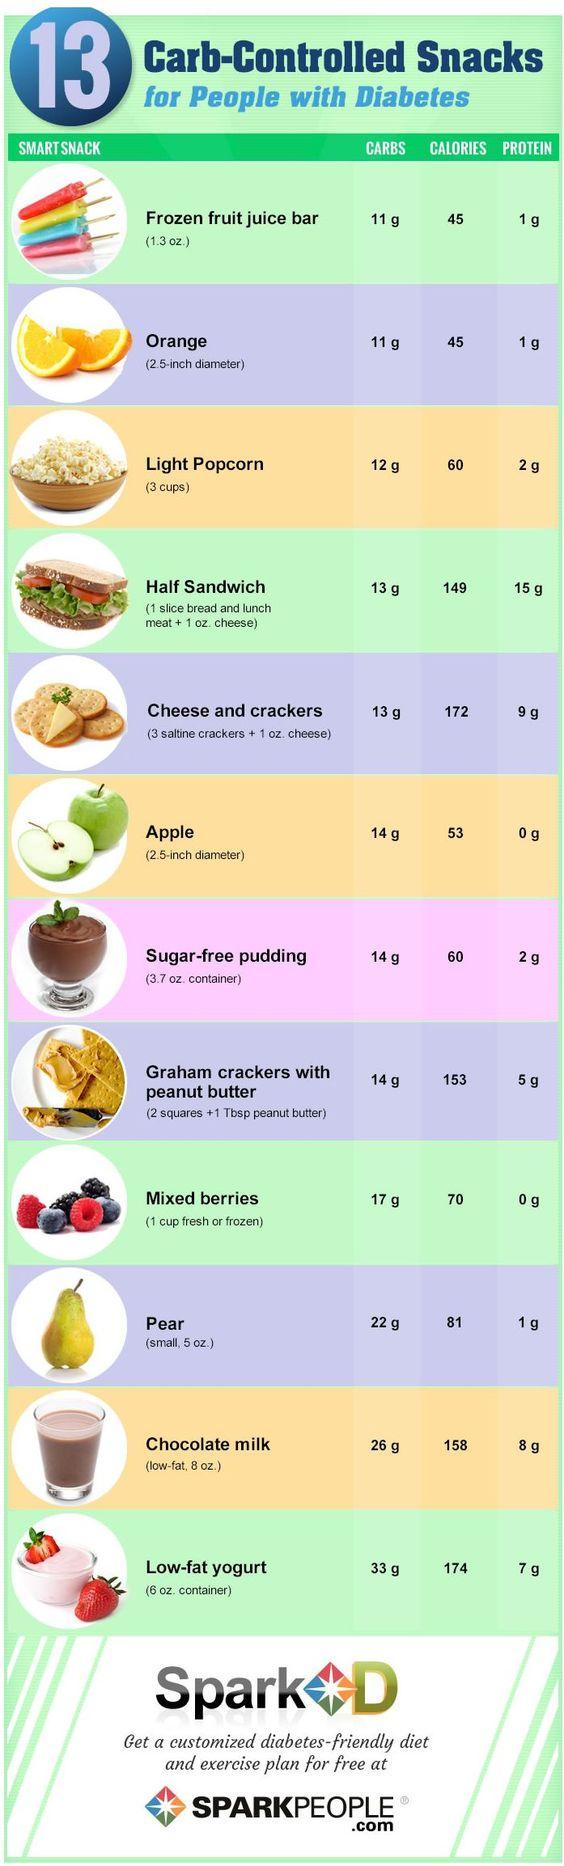 13 Carb-Controlled Snacks | via @SparkPeople #diabetes #nutrition #SparkD